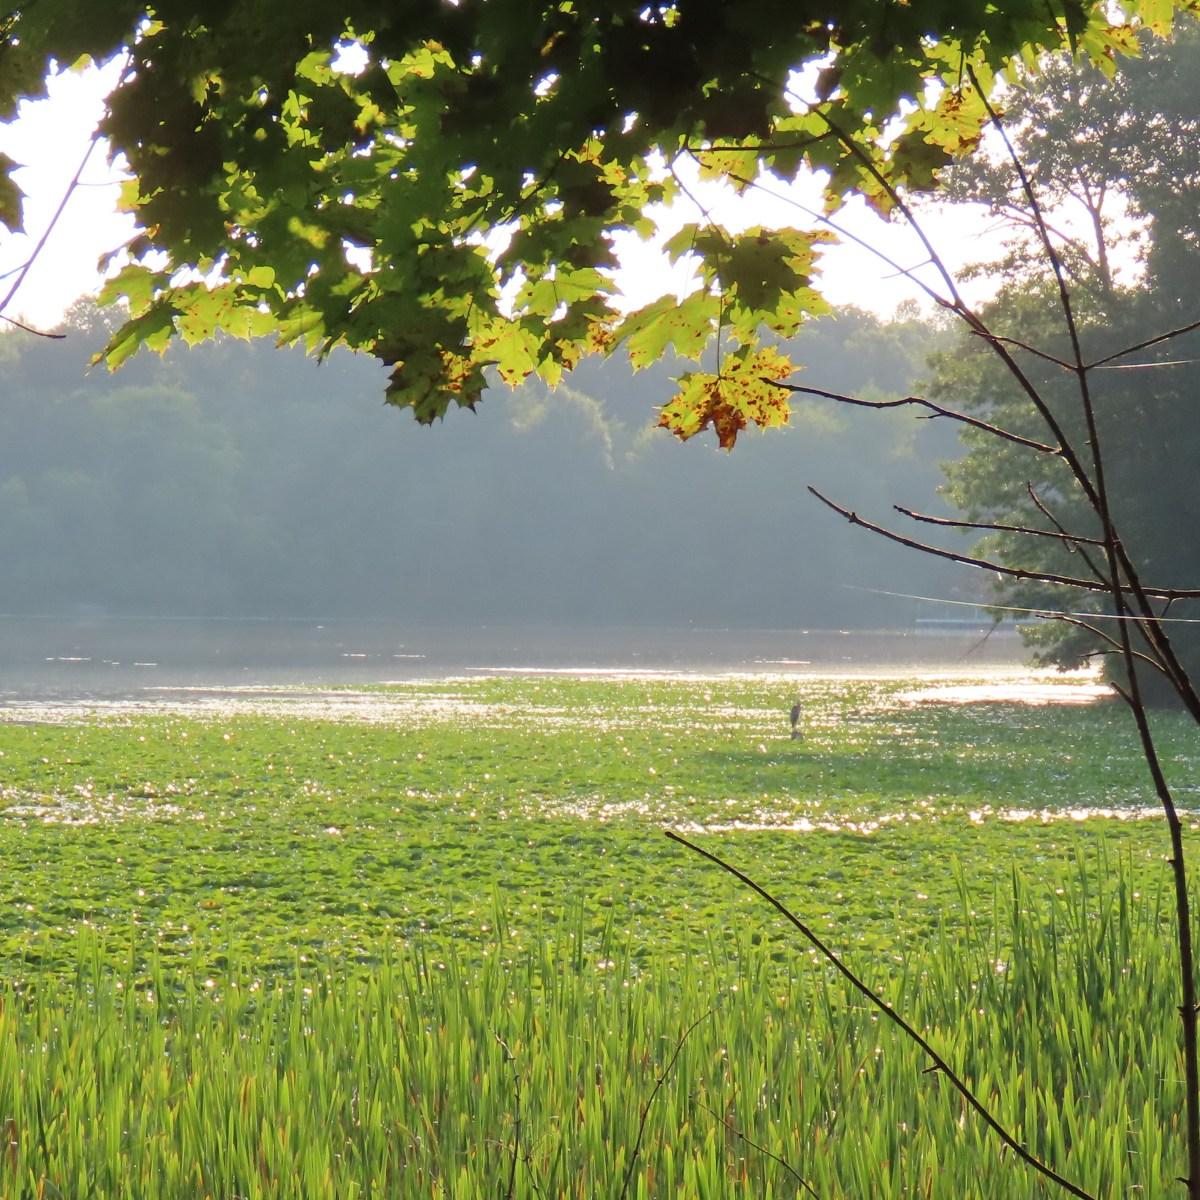 A hazy, but sunny, summer evening at a lake